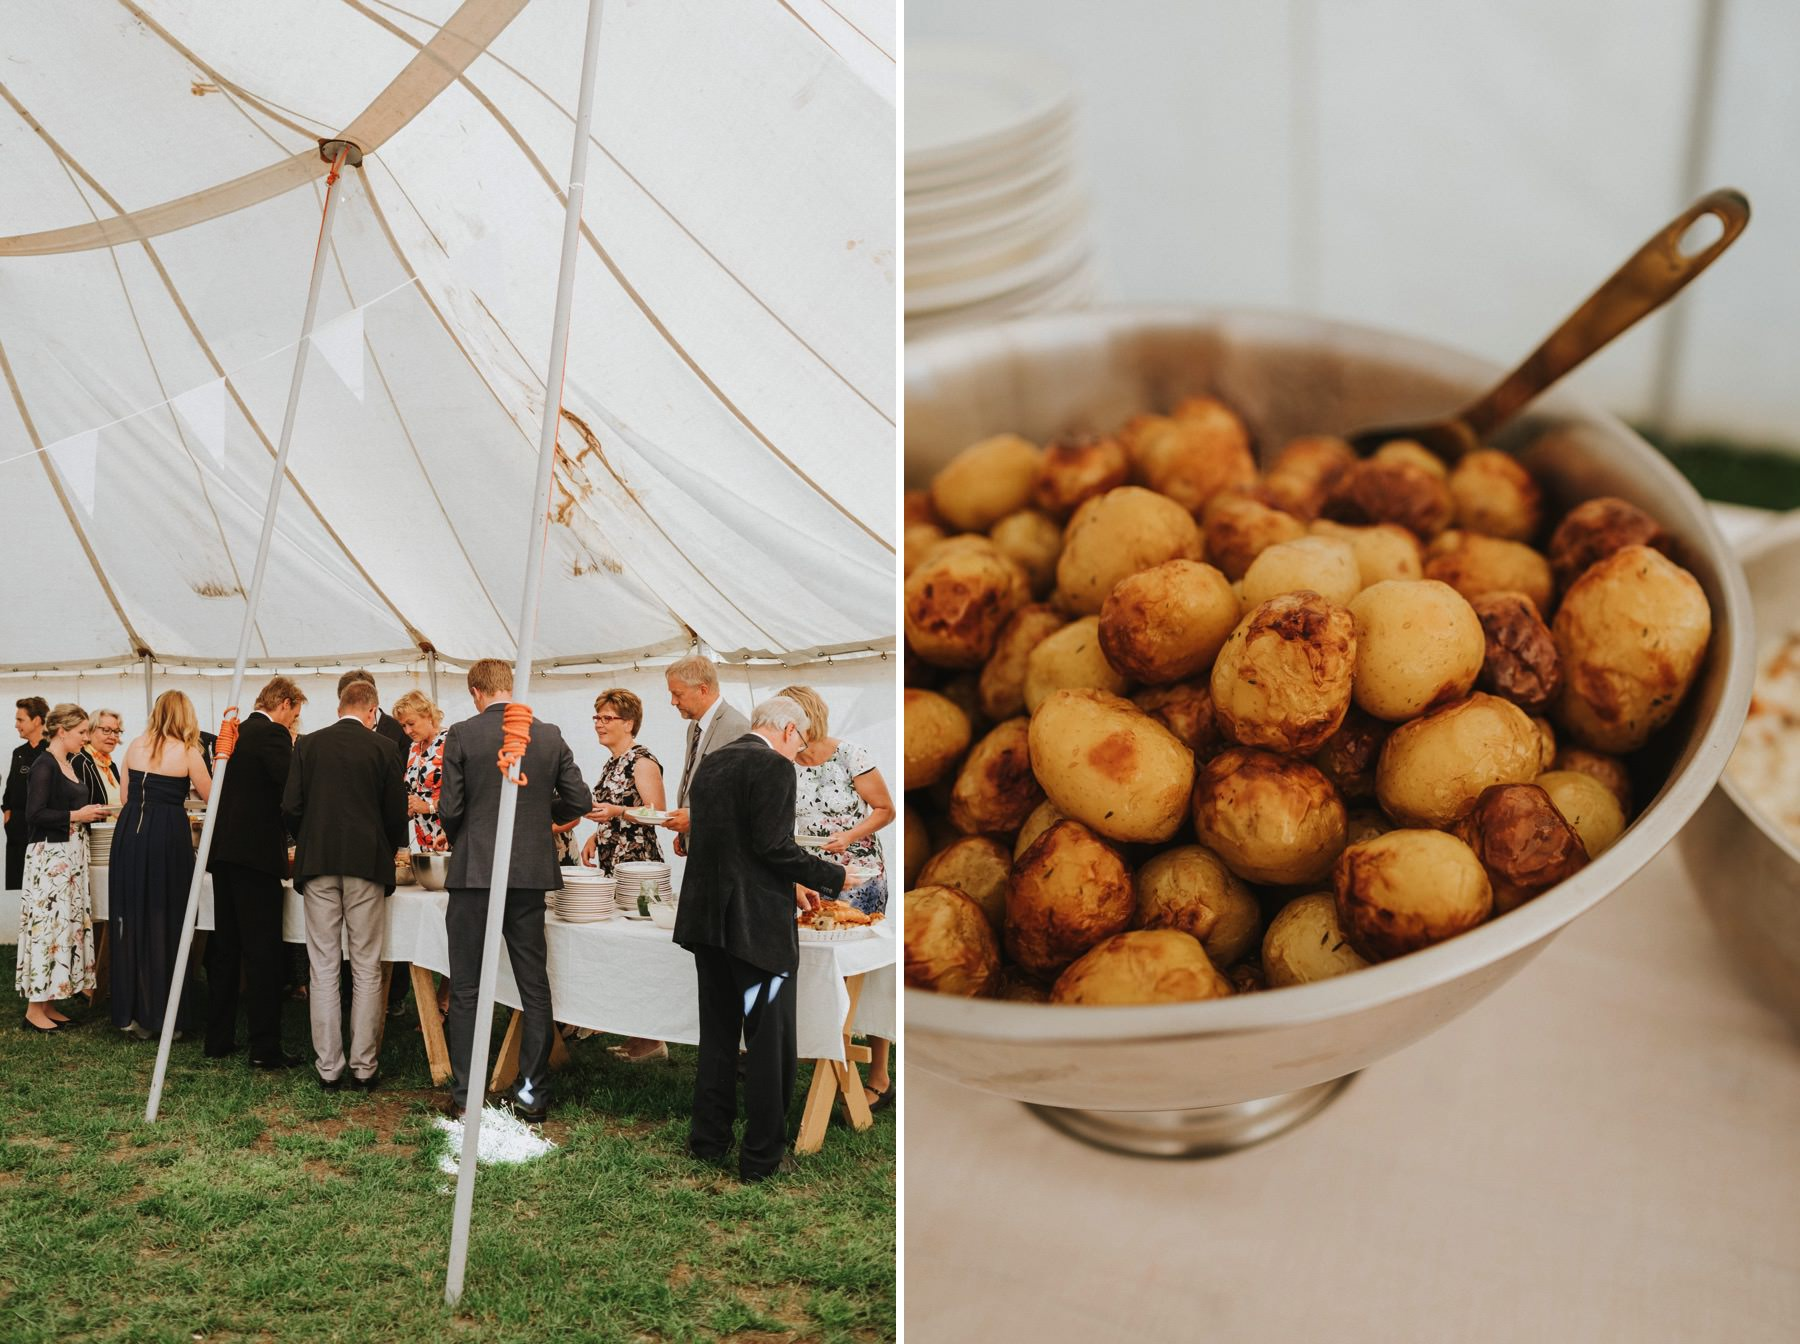 Kronoby bröllop